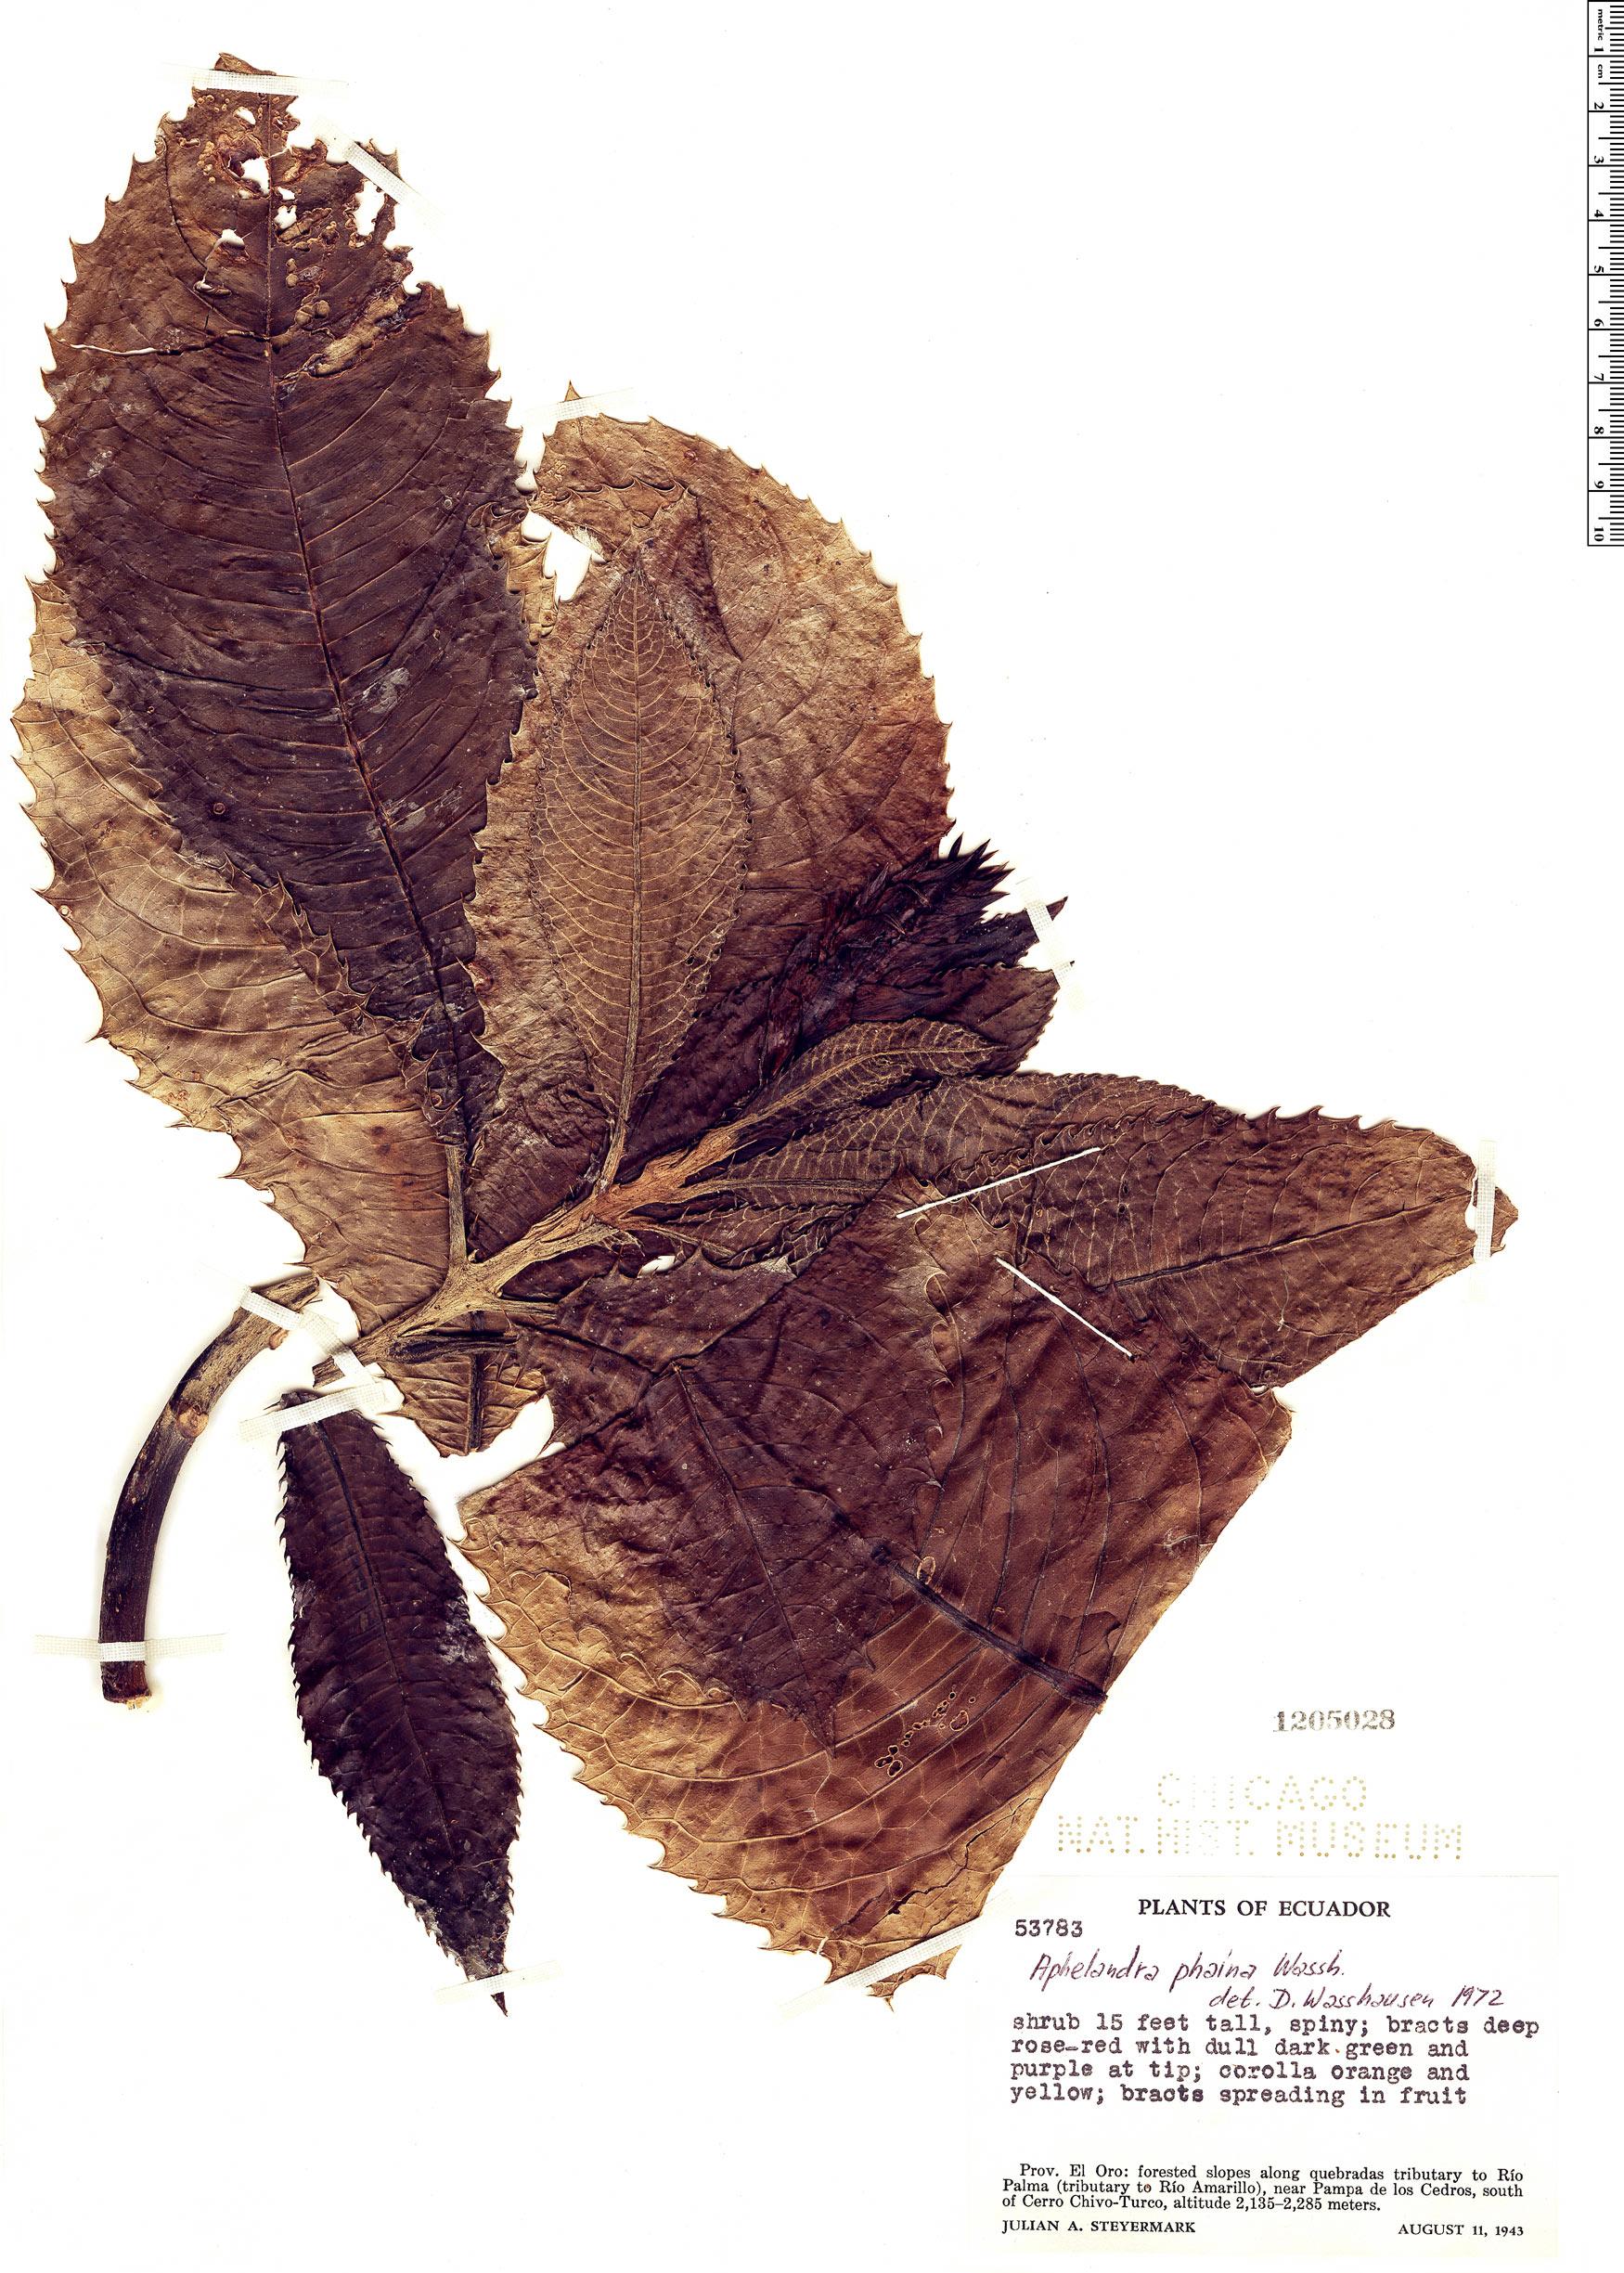 Specimen: Aphelandra phaina